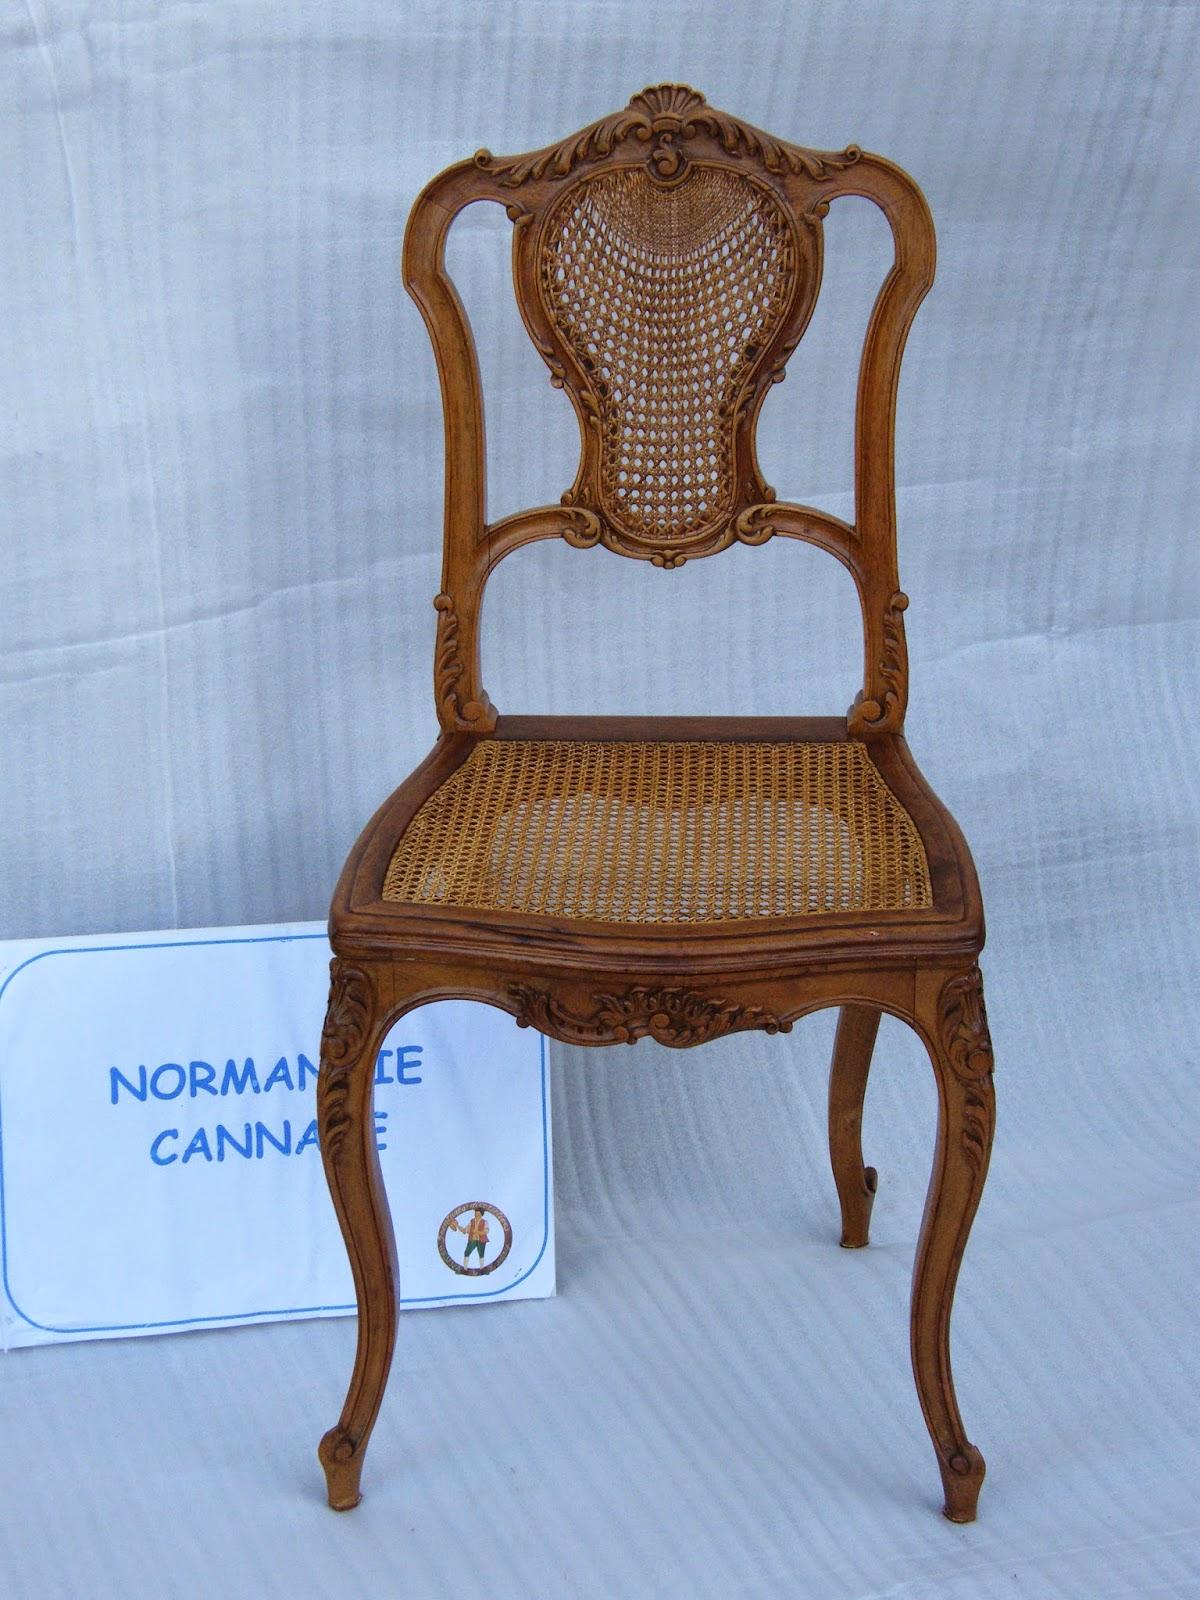 normandie cannage chaise et fauteuil style louis xv cann s. Black Bedroom Furniture Sets. Home Design Ideas